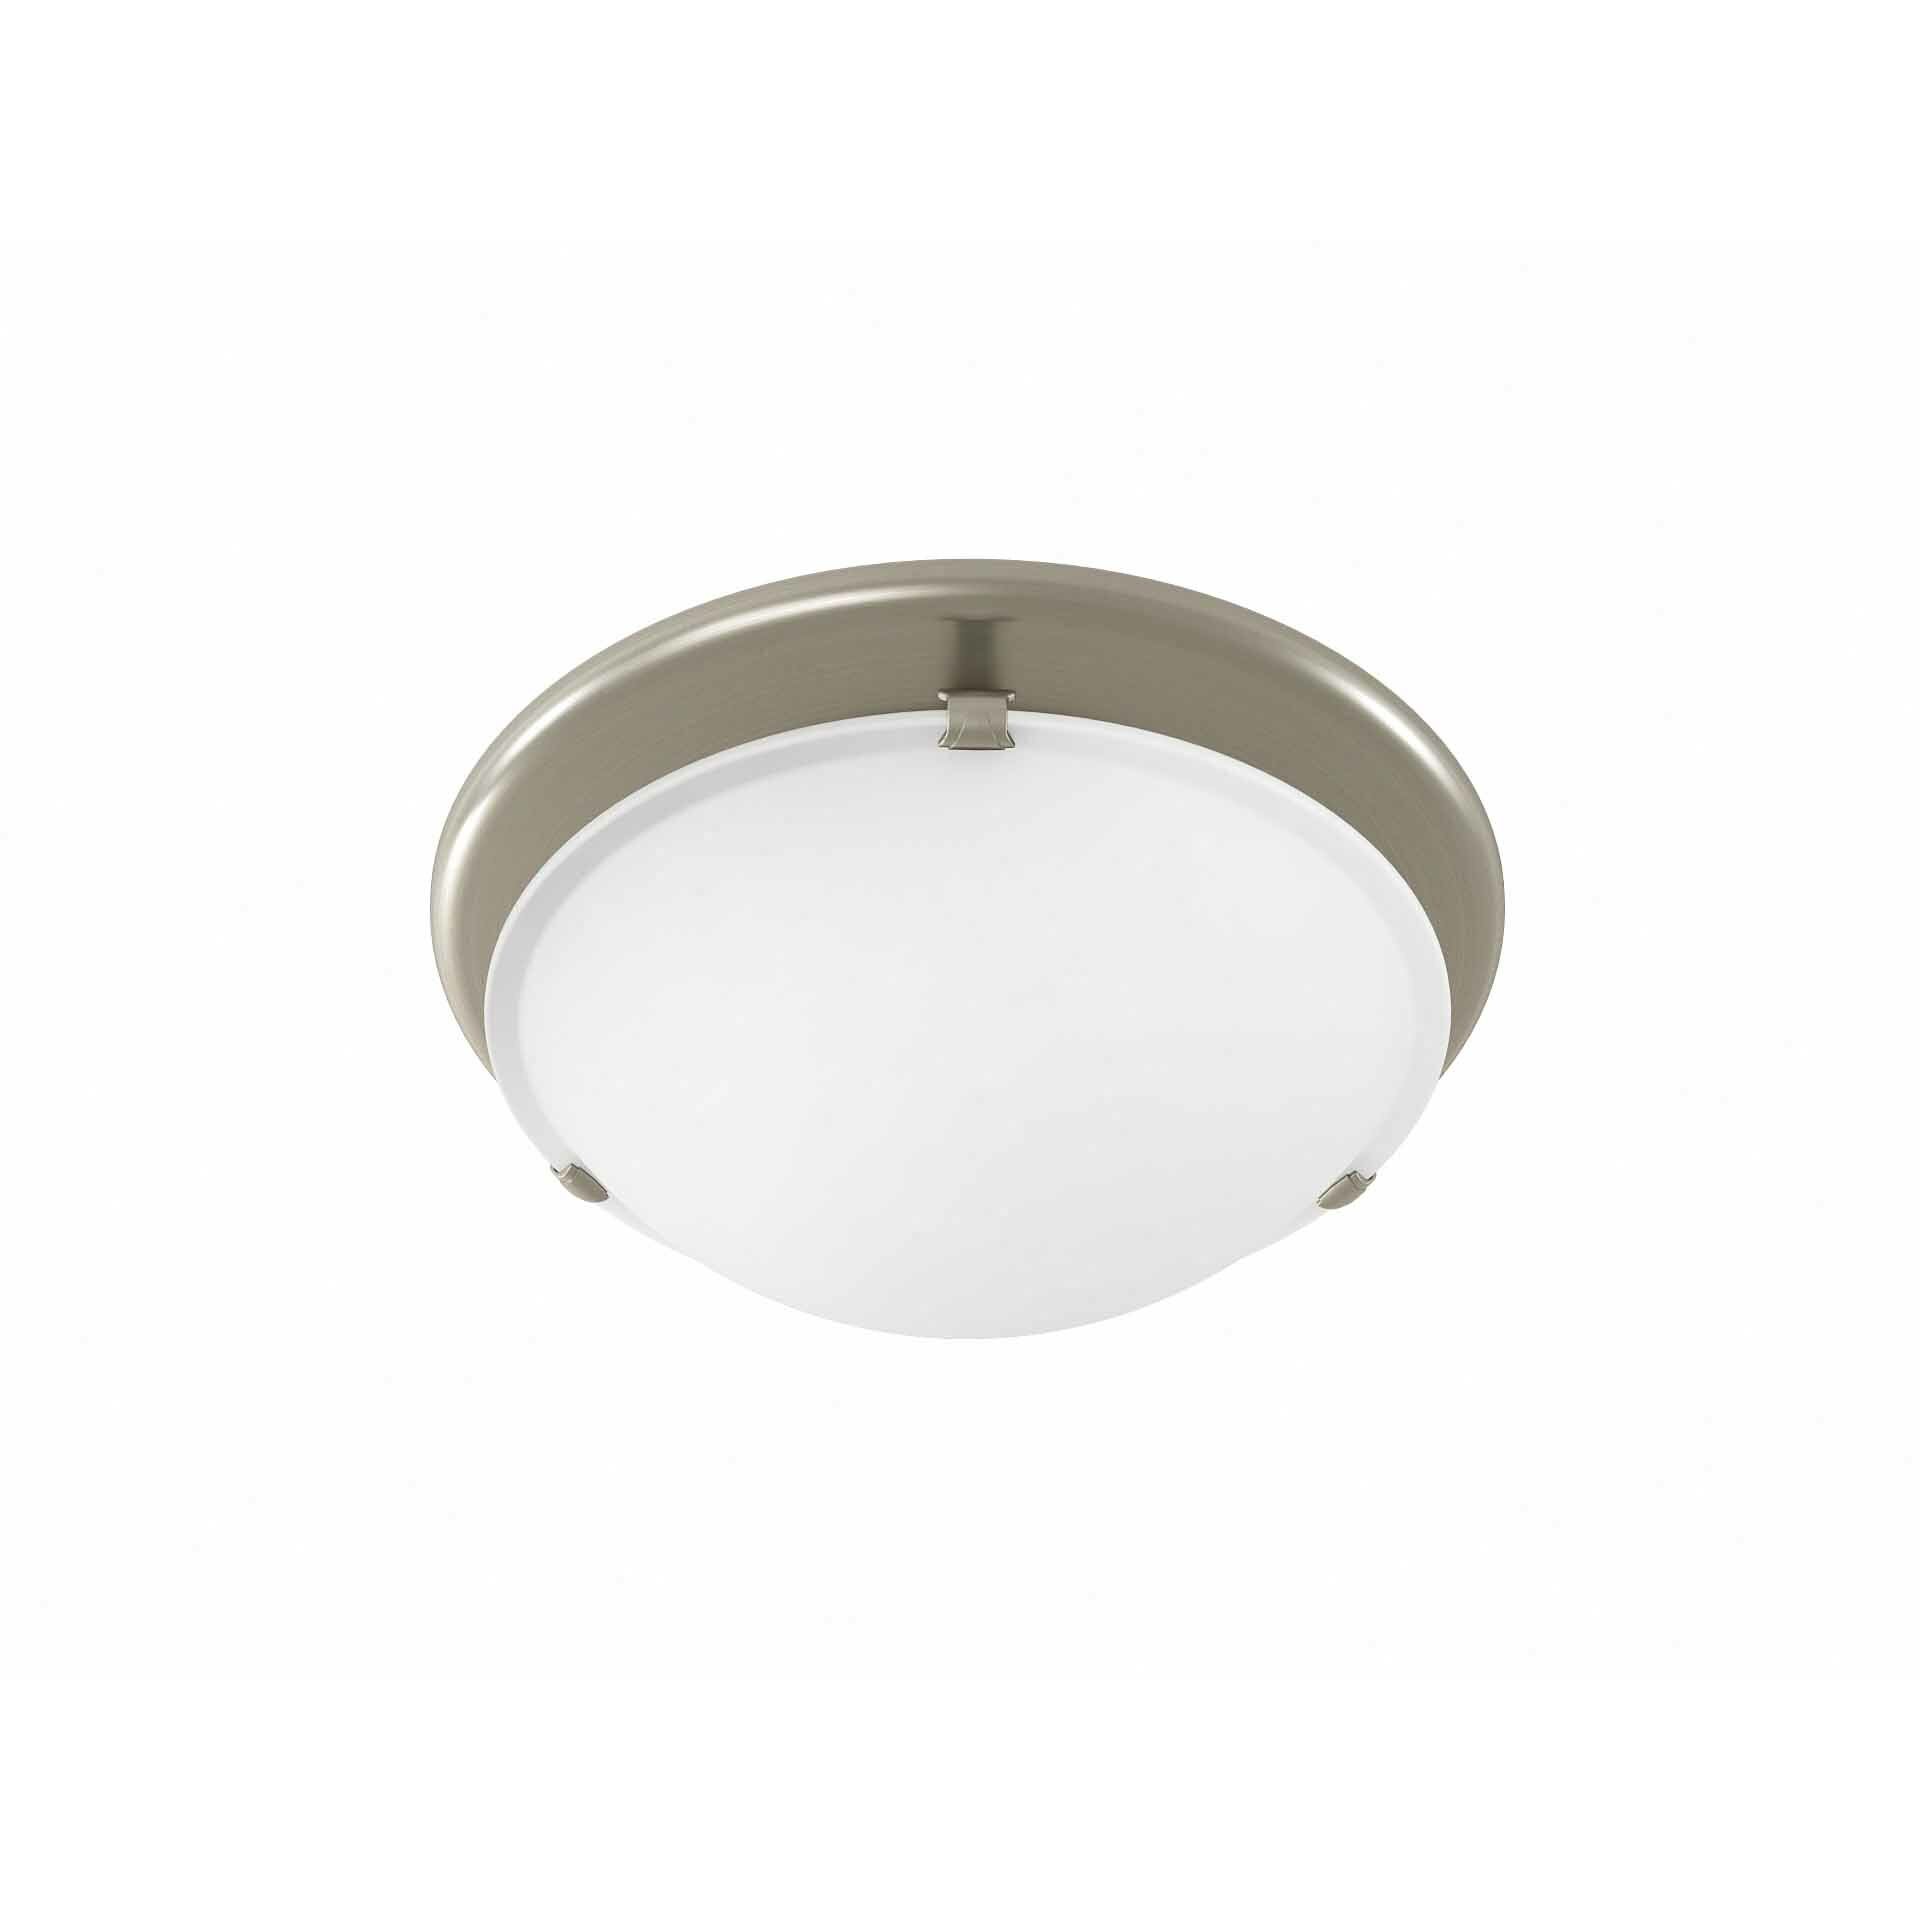 Broan 80 CFM Bathroom Fan with Light. Broan 80 CFM Bathroom Fan with Light   Reviews   Wayfair